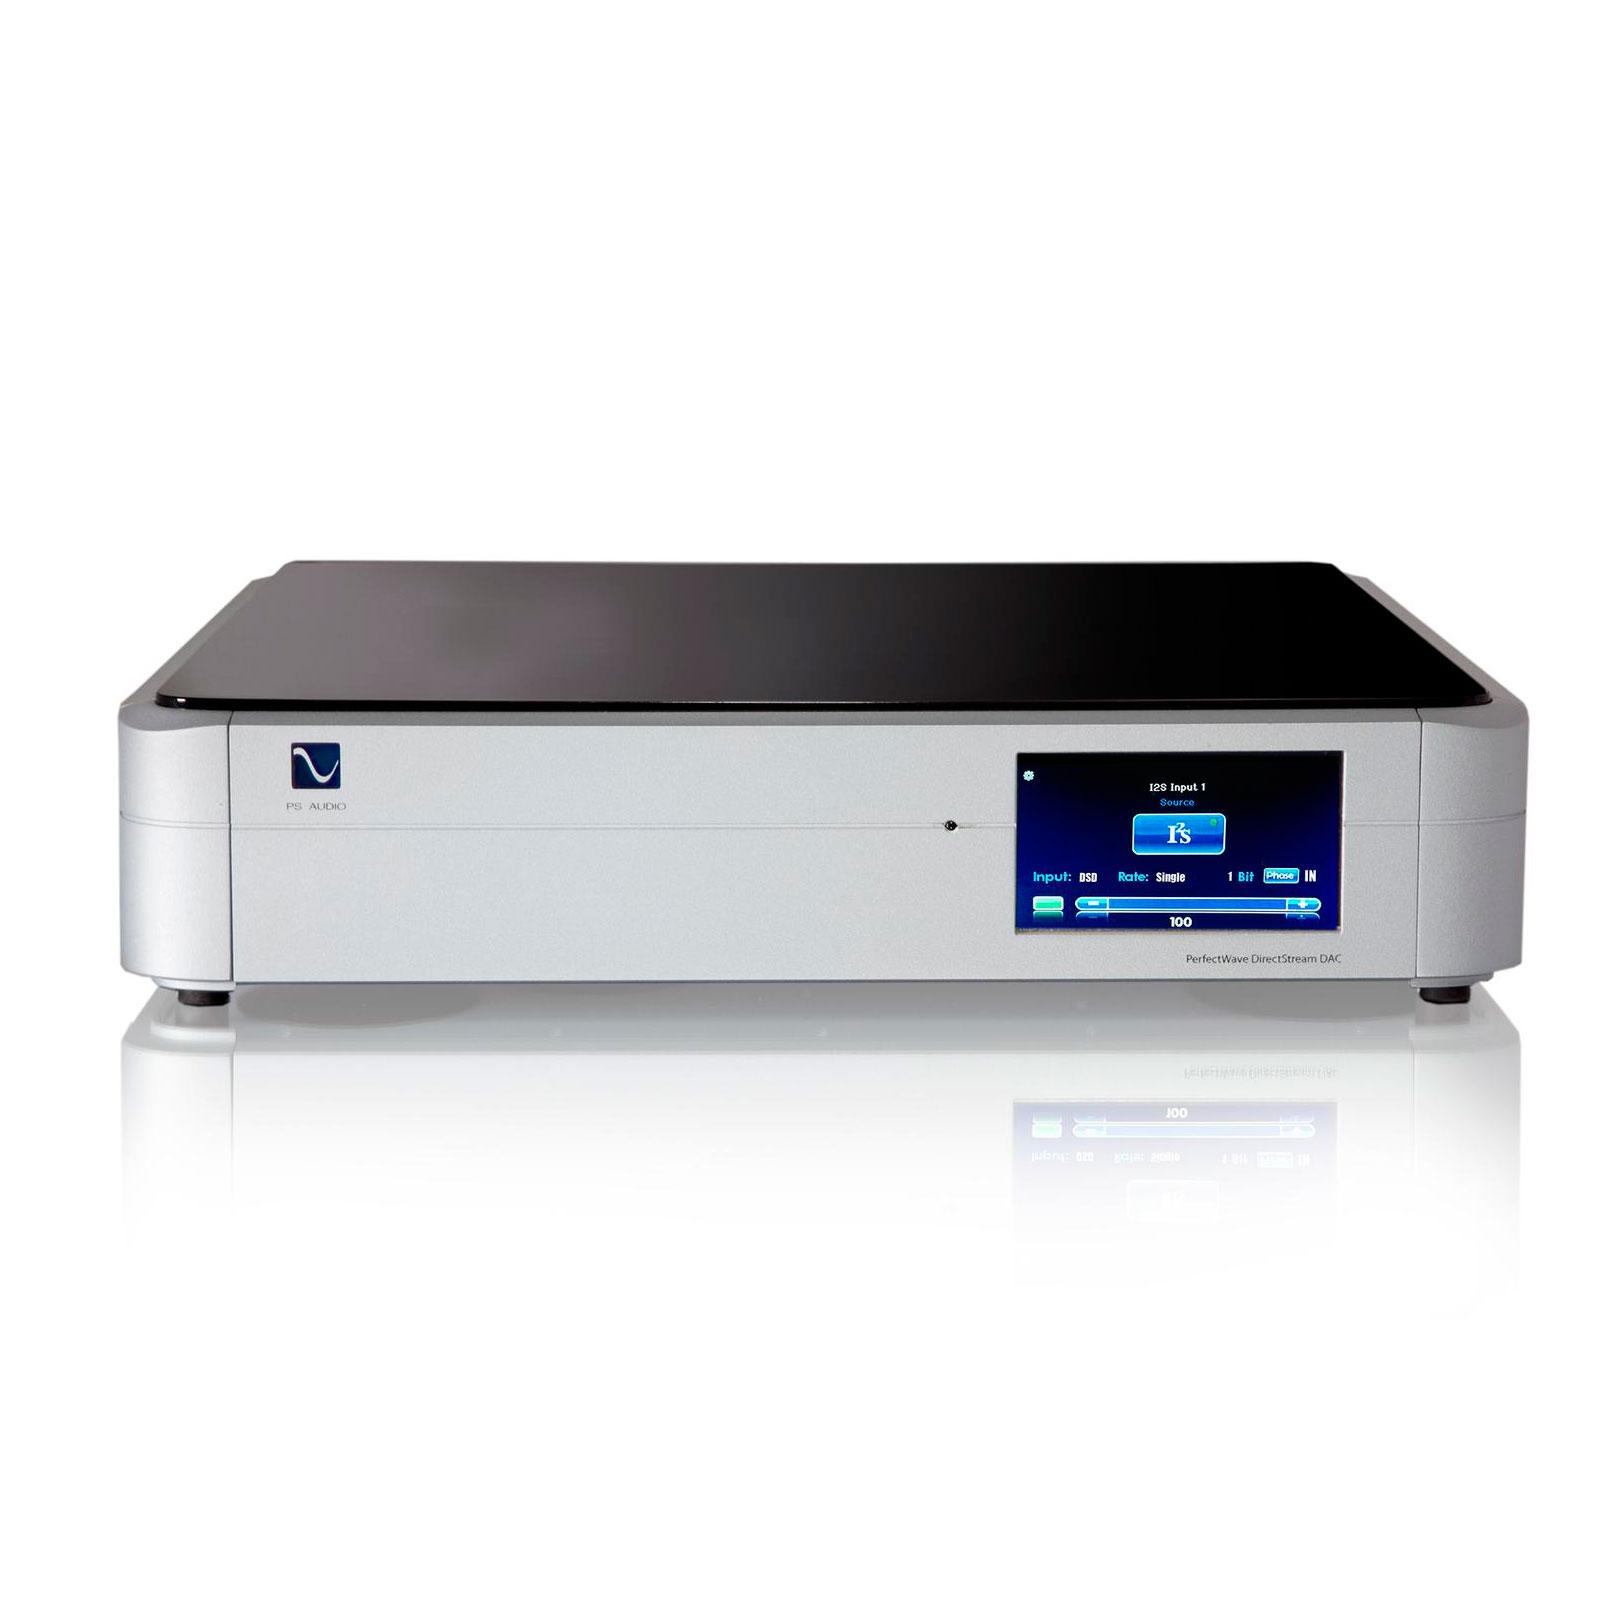 Fi racks limited lenehan audio ortofon palmer audio primaluna ps audio